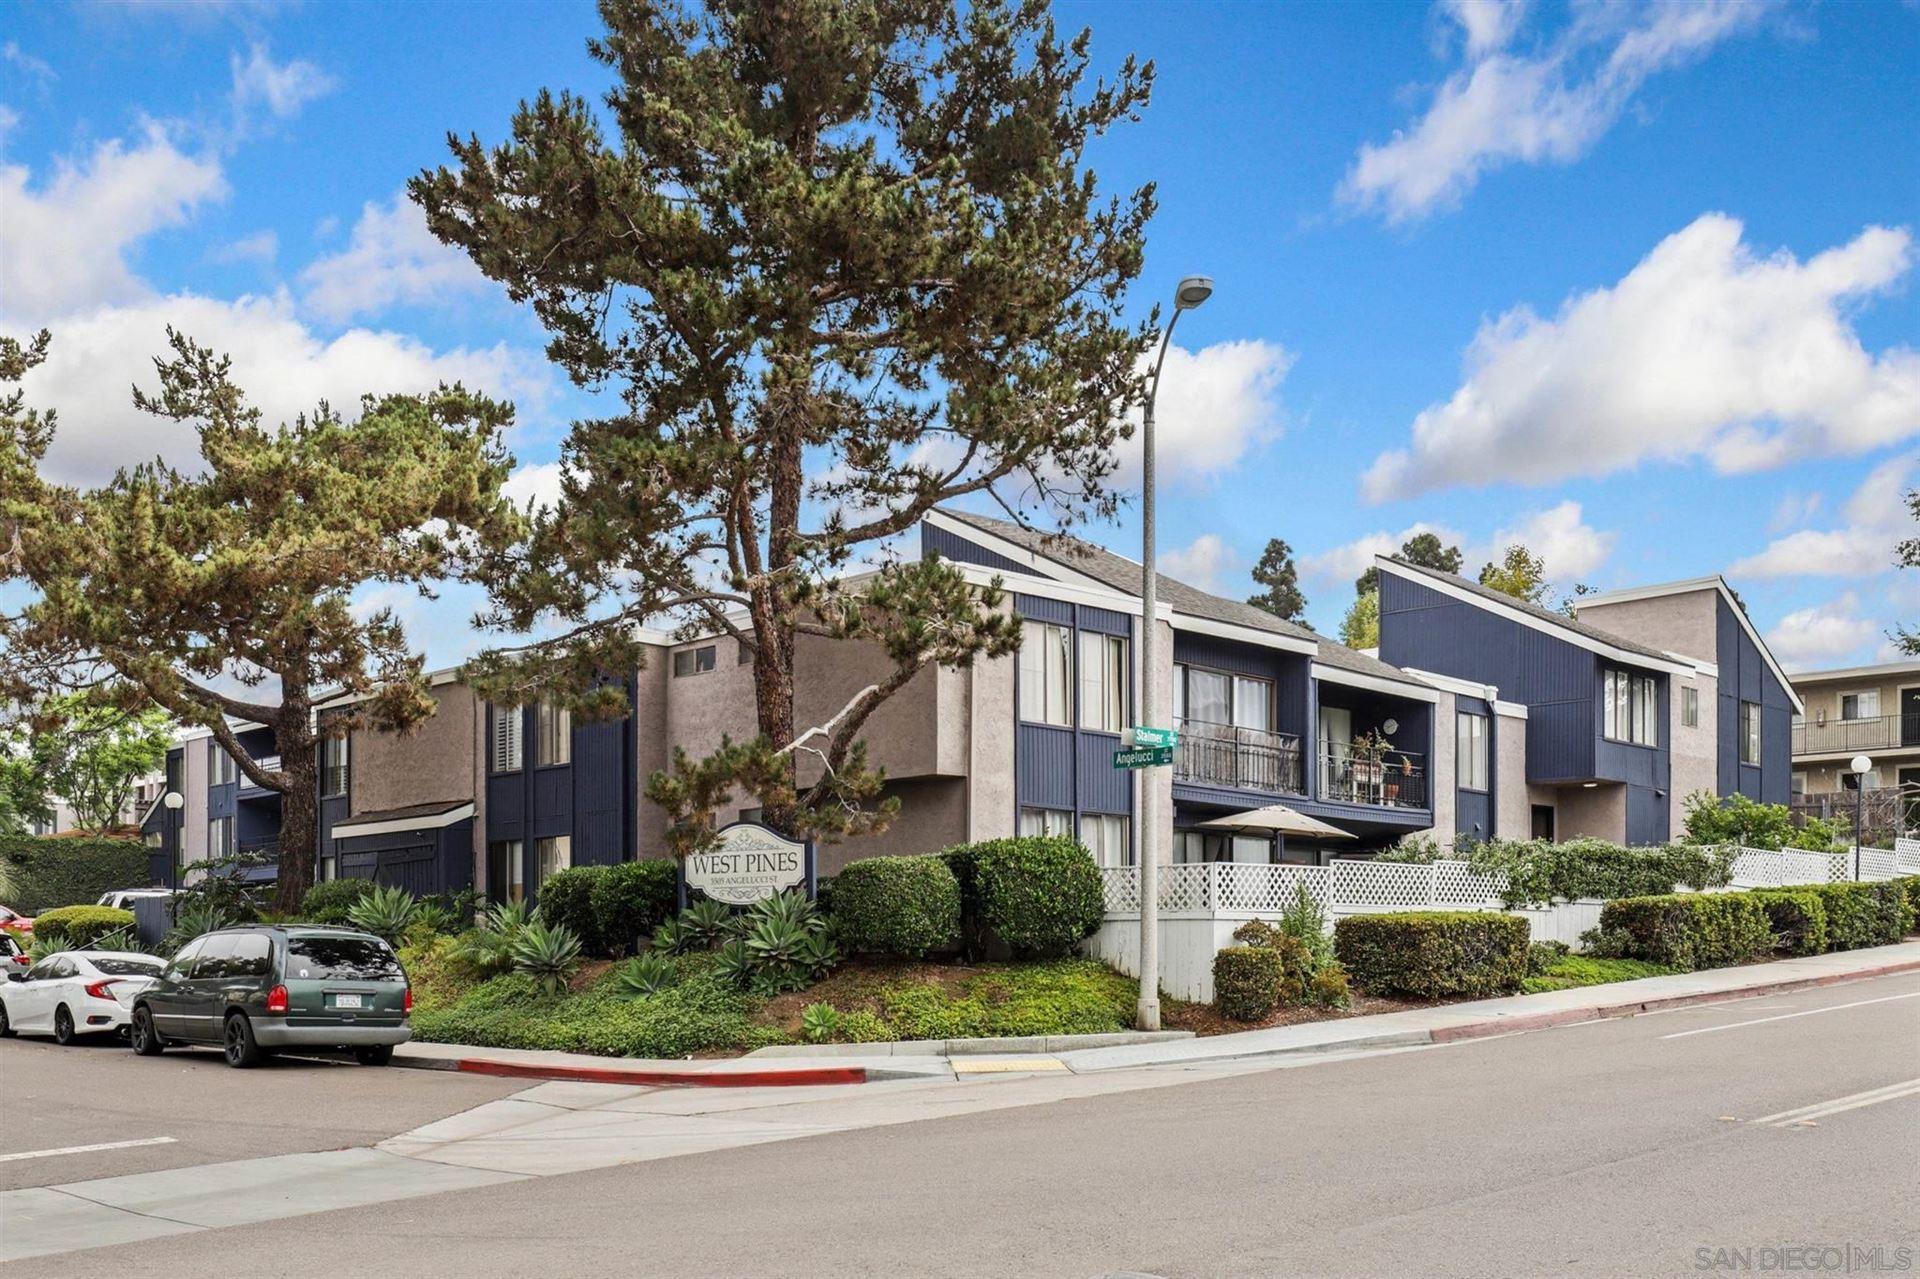 3505 Angelucci #1F, San Diego, CA 92111 - MLS#: 210021463